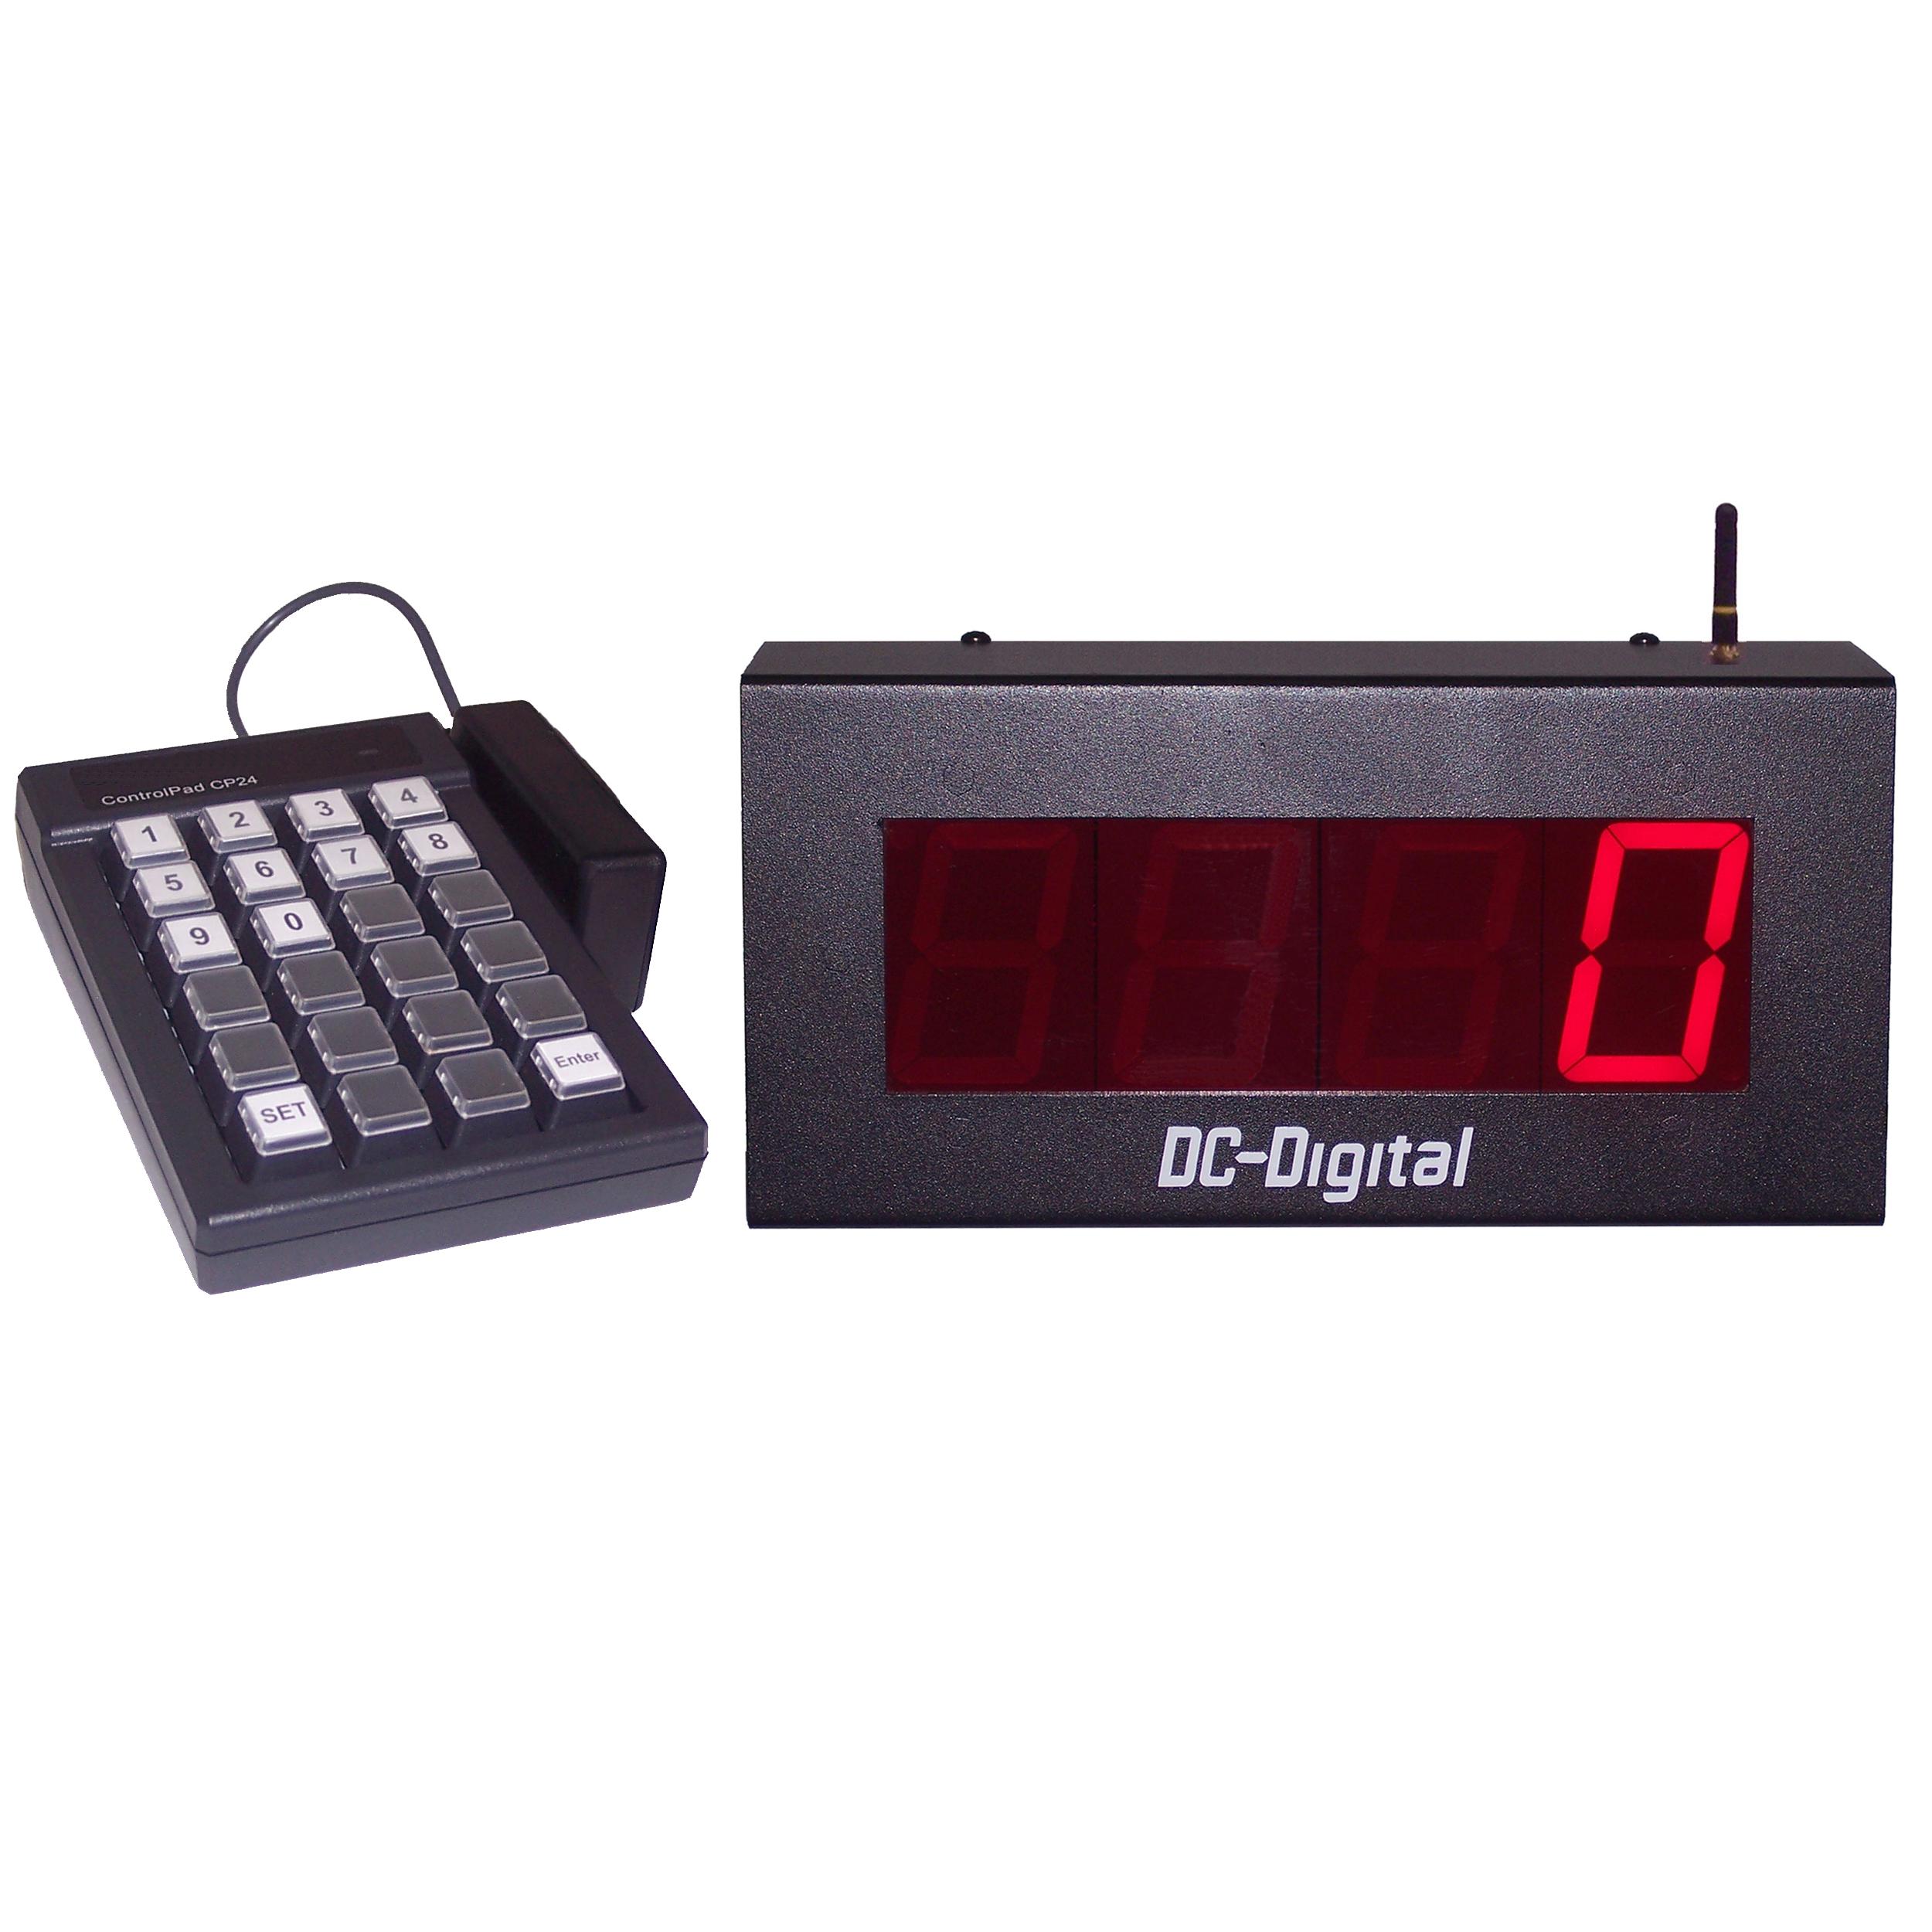 DC-25-Static-Key-W-Wireless-Keypad-Controlled-Number-Display-2.3-Inch-Digit